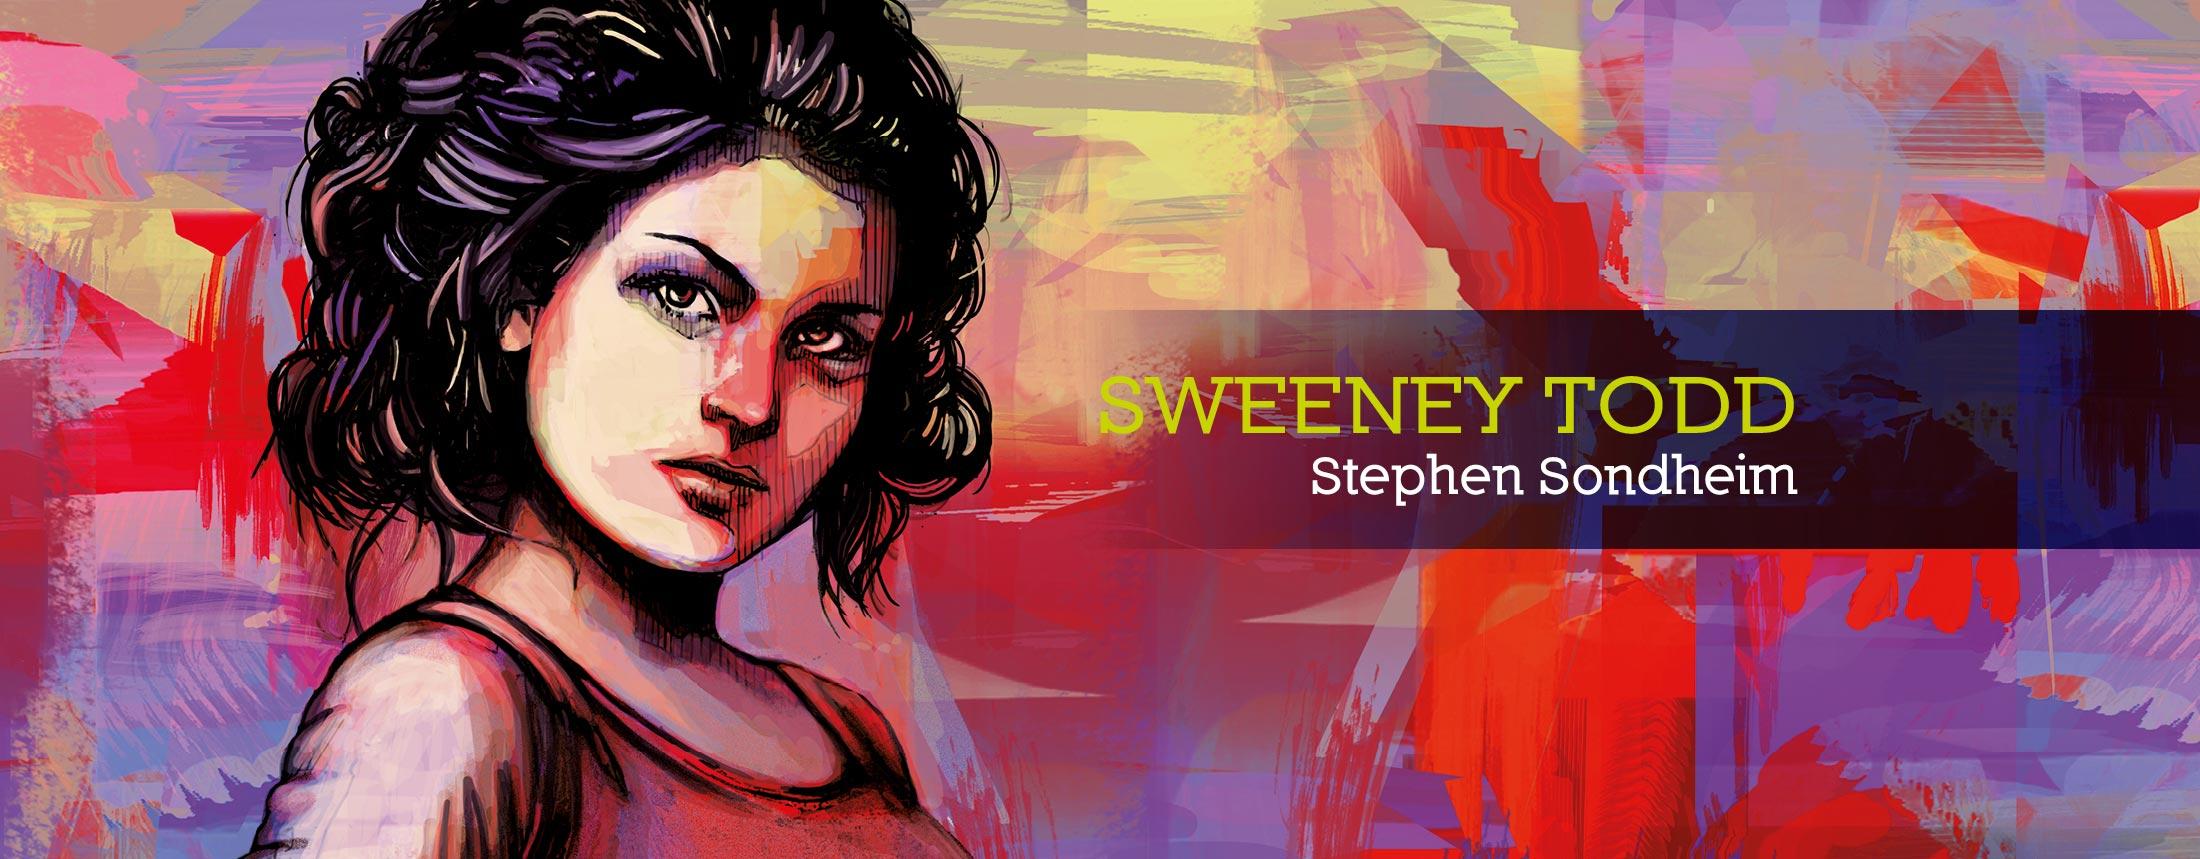 TCBO_2200x859-Sweeney-Todd_0918